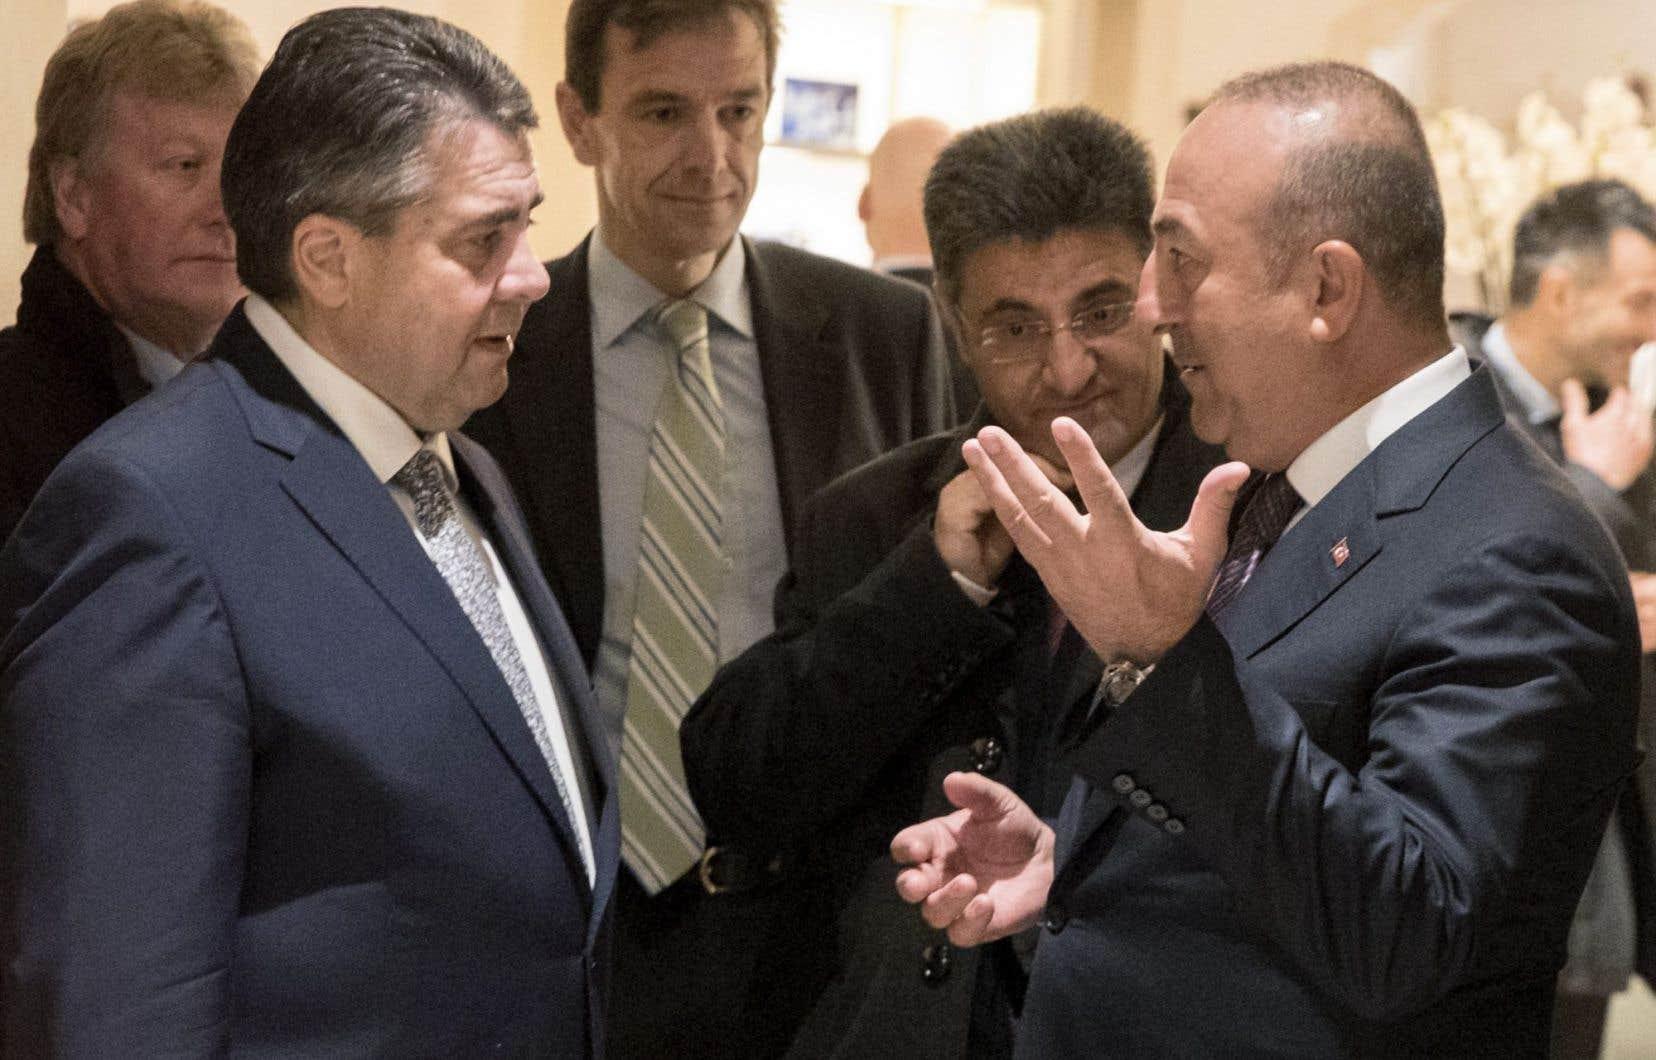 Rencontre entre le chef de la diplomatie allemande, Sigmar Gabriel, et son homologue turc, Mevlüt Cavusoglu, le 8 mars 2017